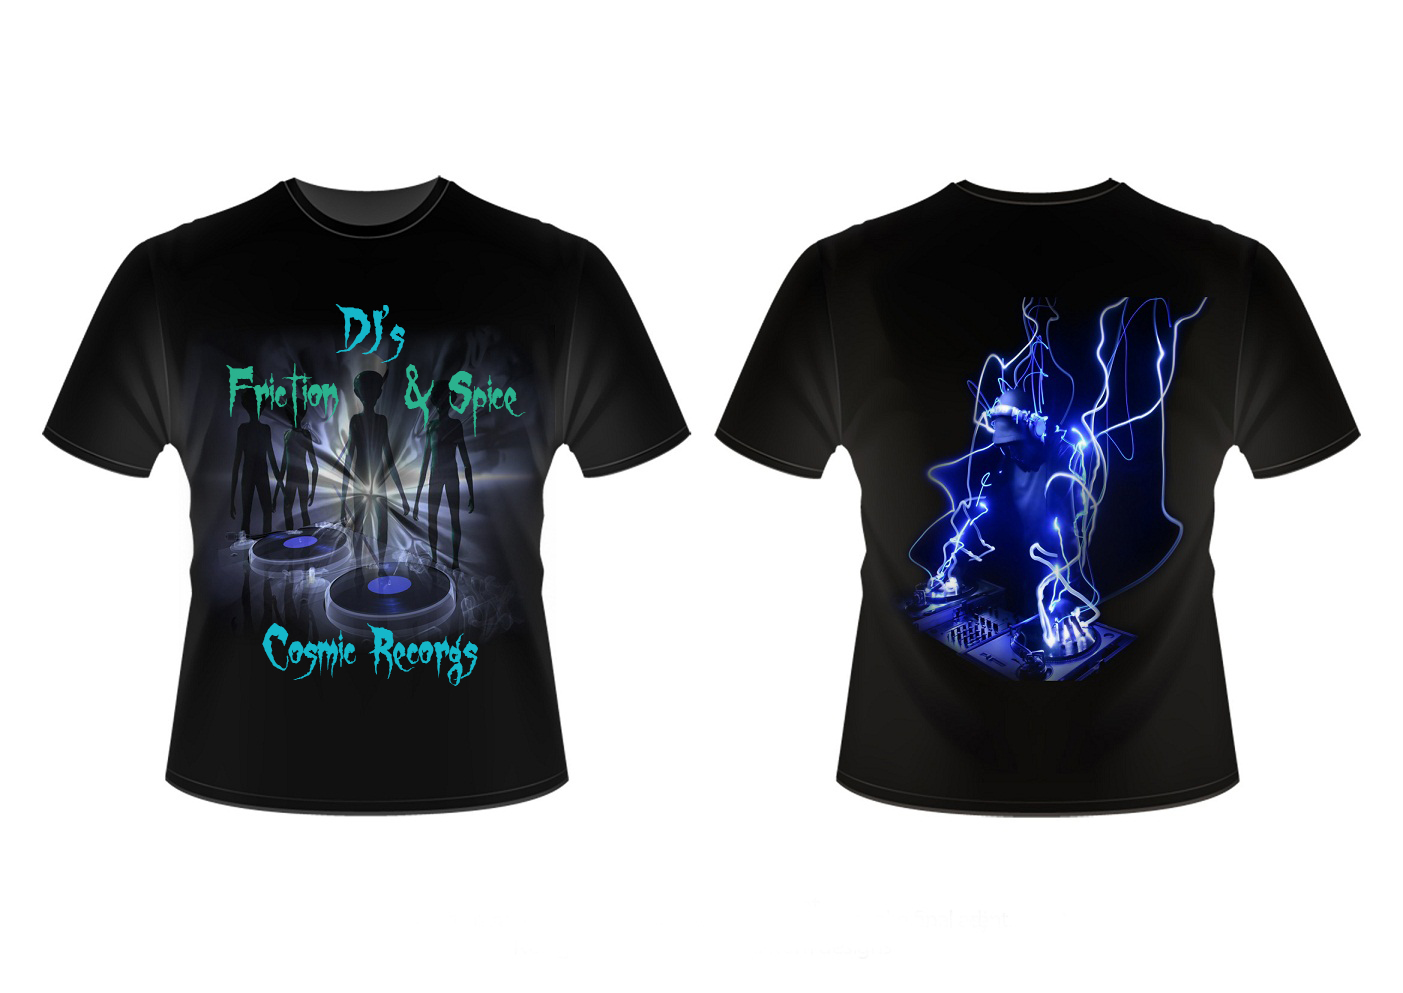 Shirt design needed - T Shirt Design By Abhinavksalinkar For Awesome Dj T Shirt Design Needed Design